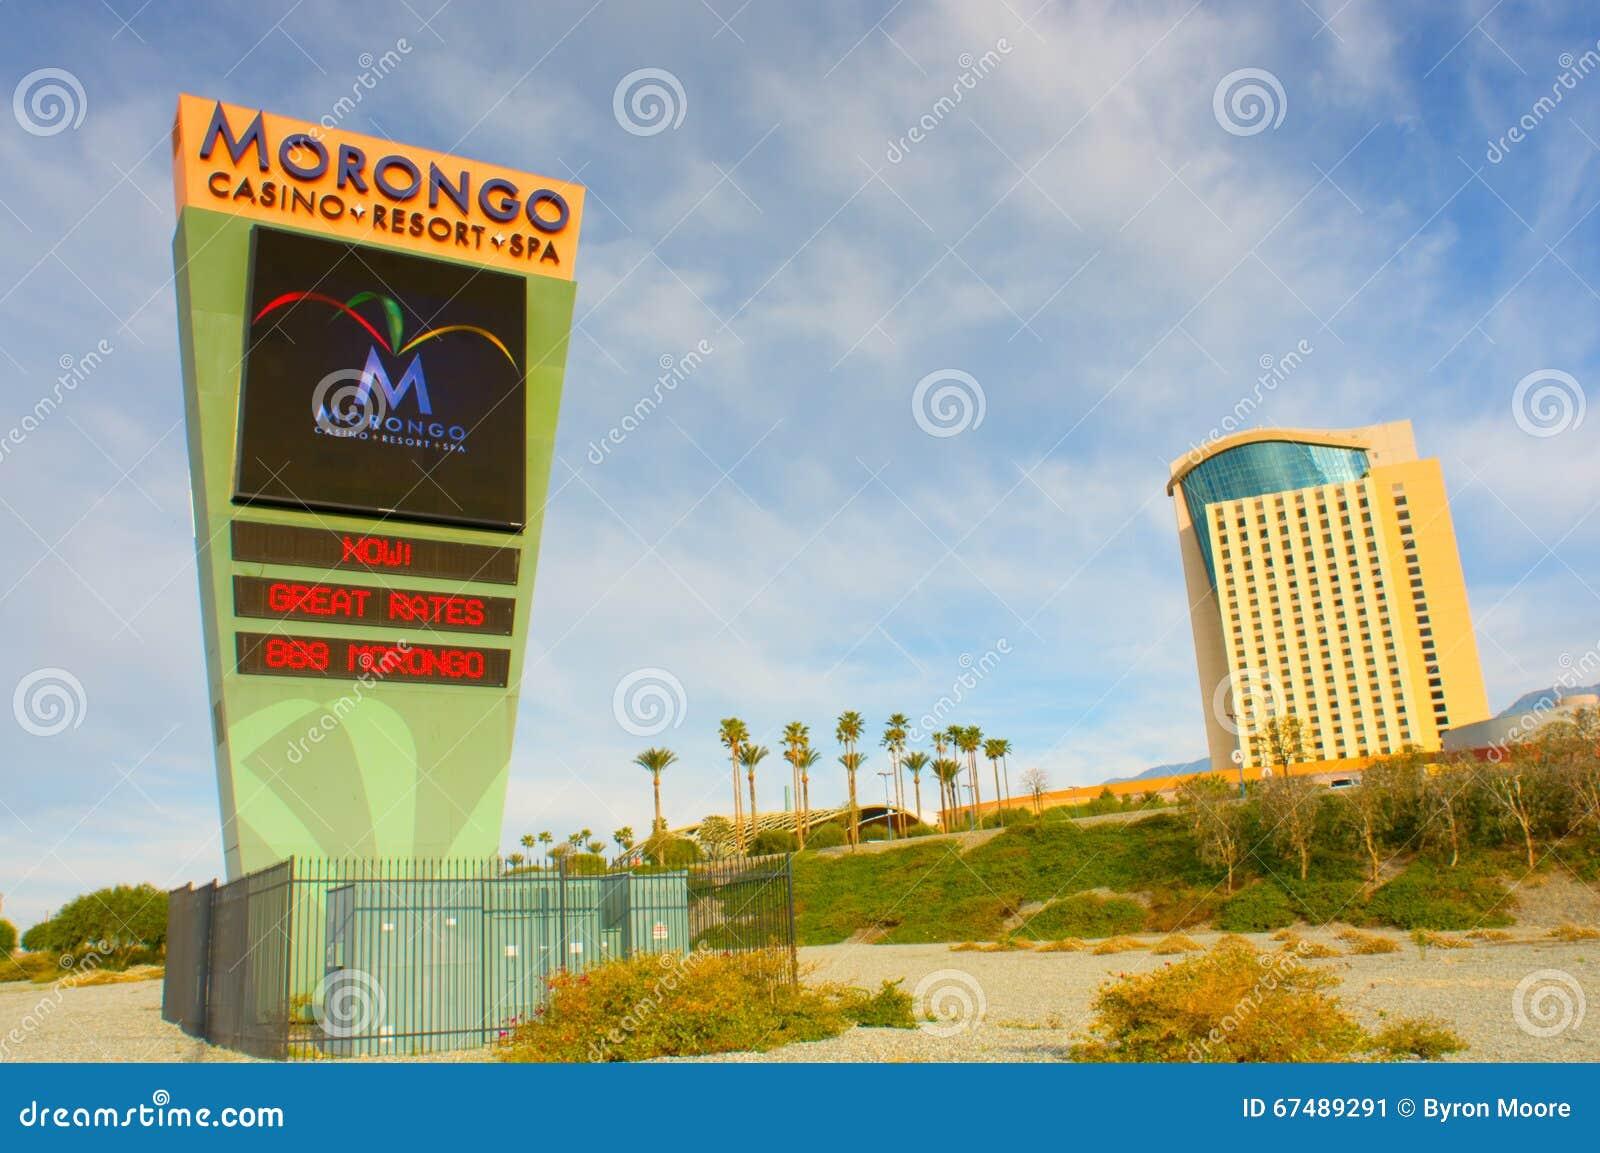 casino casino casino casino gambling gambling online online online virtual